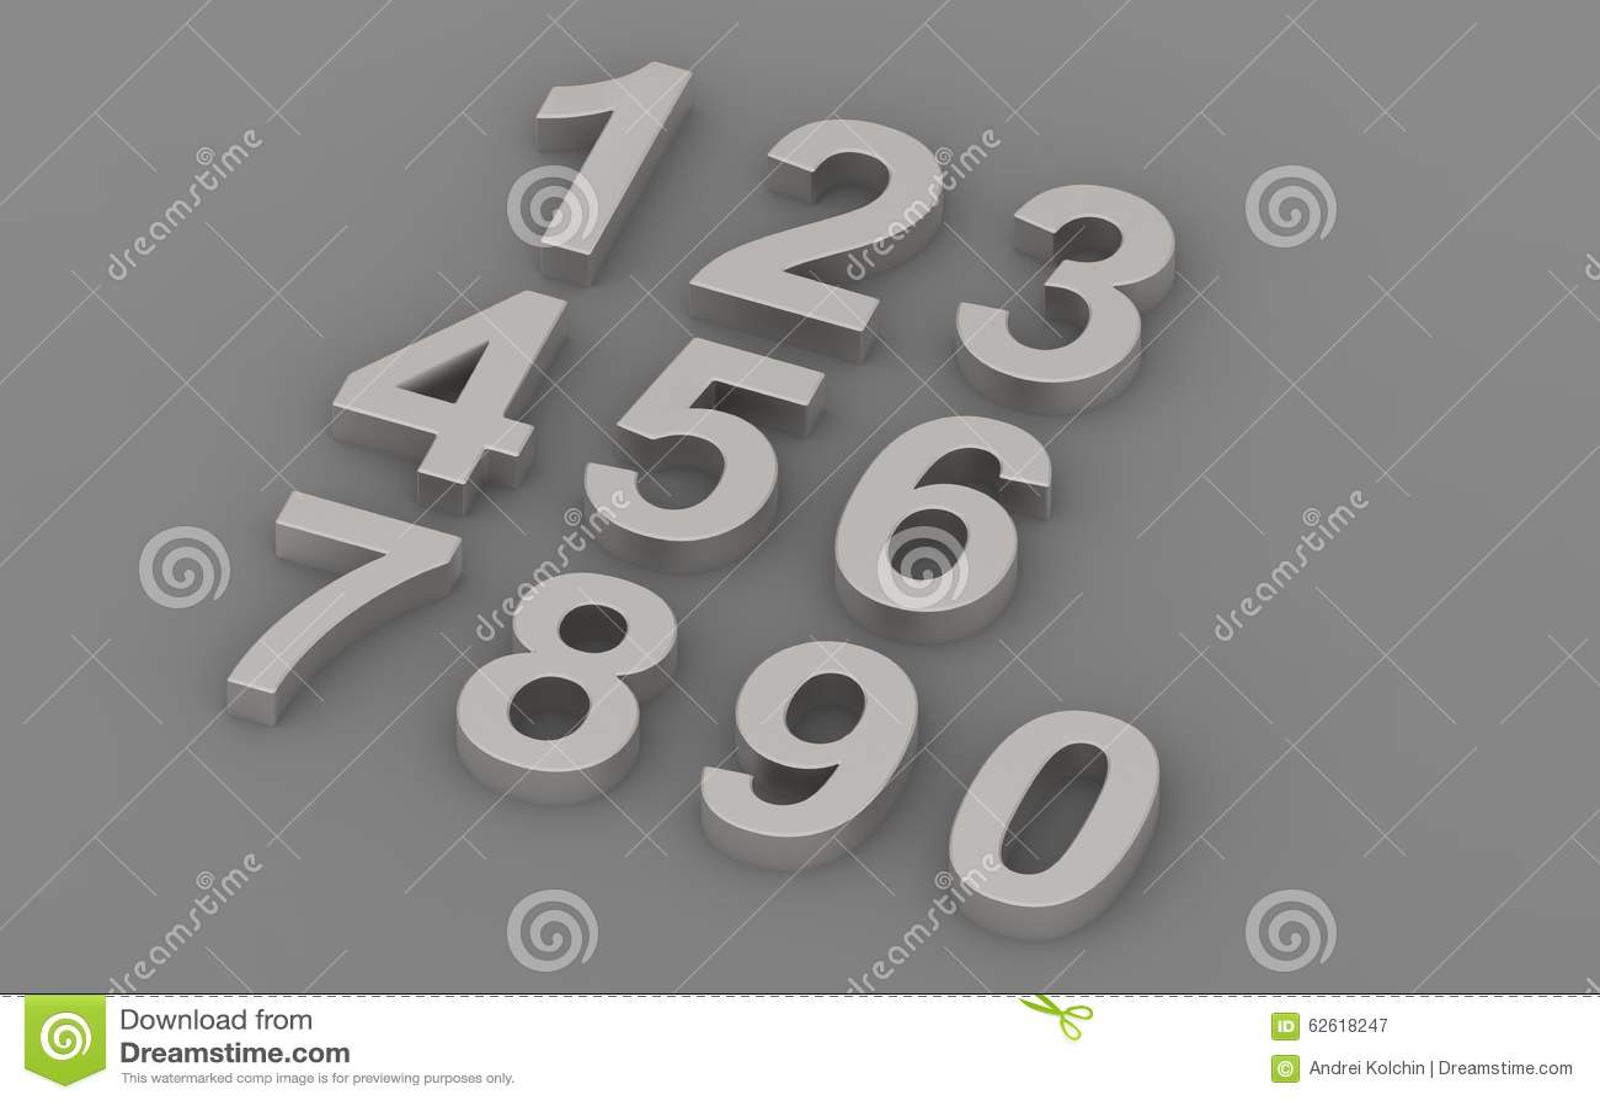 Three Dimensional Numbers Stock Illustration